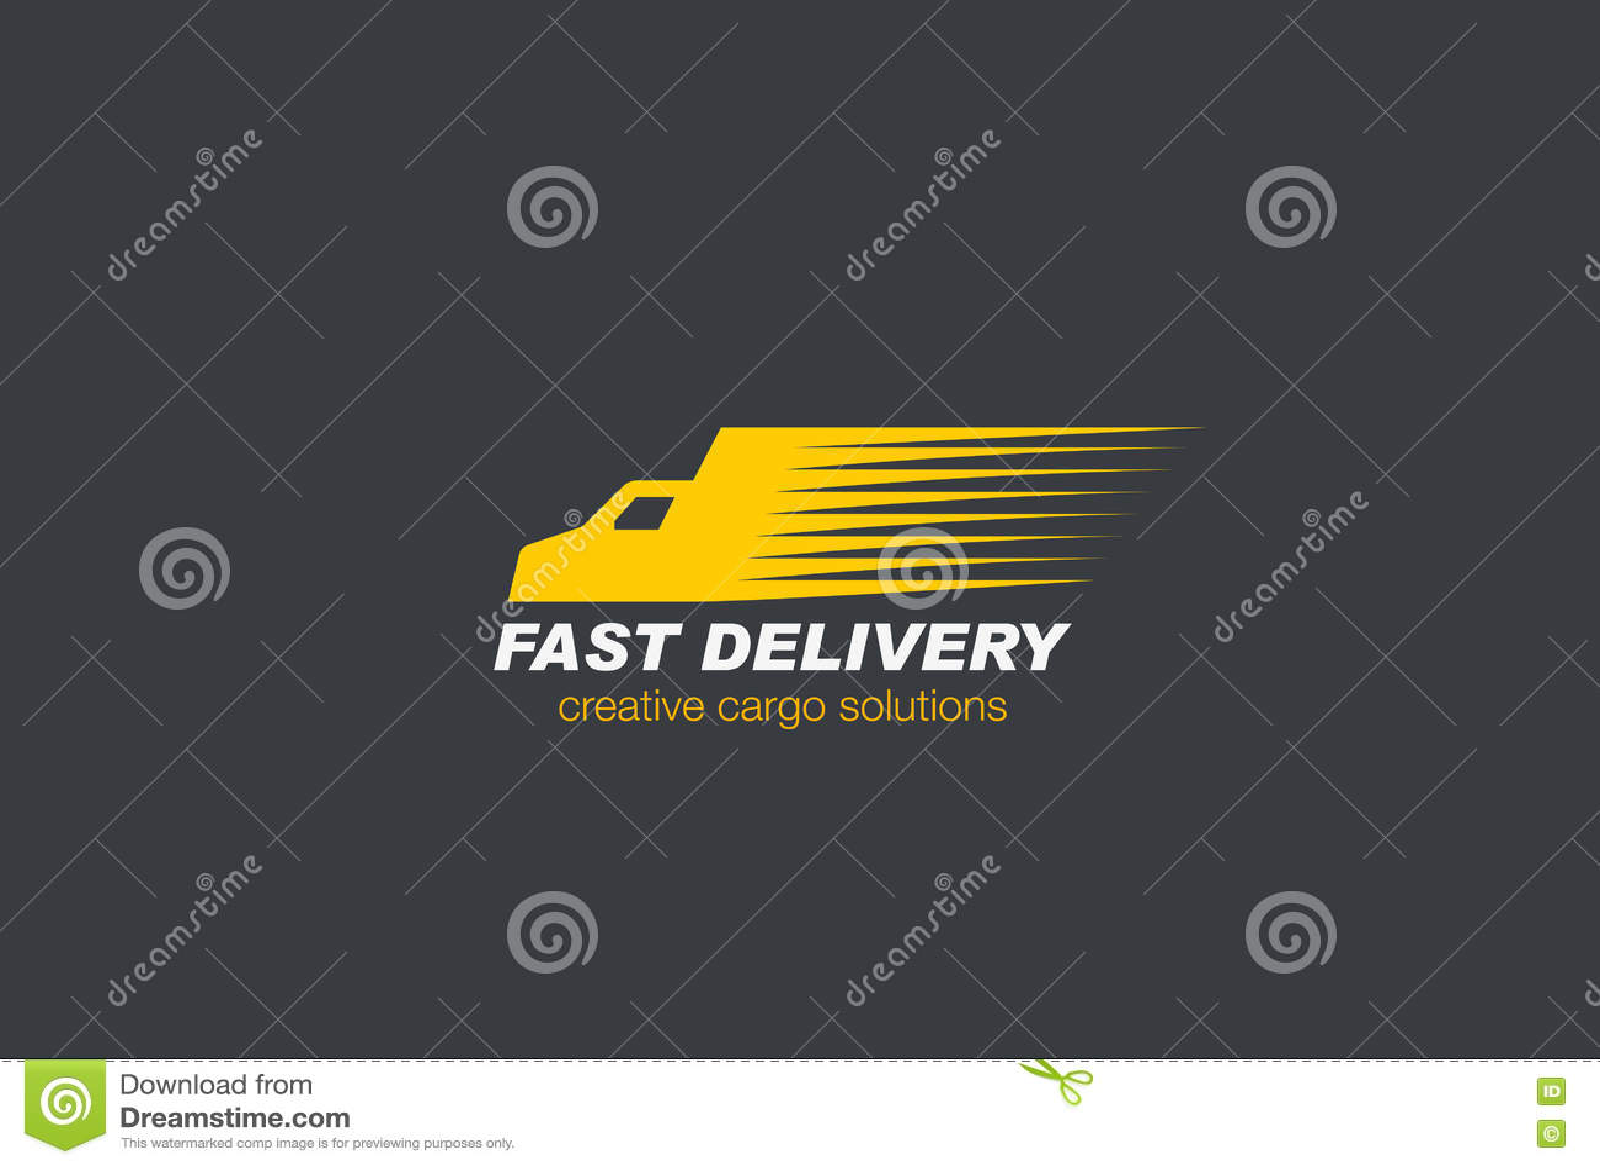 DriverLayer Search Engine